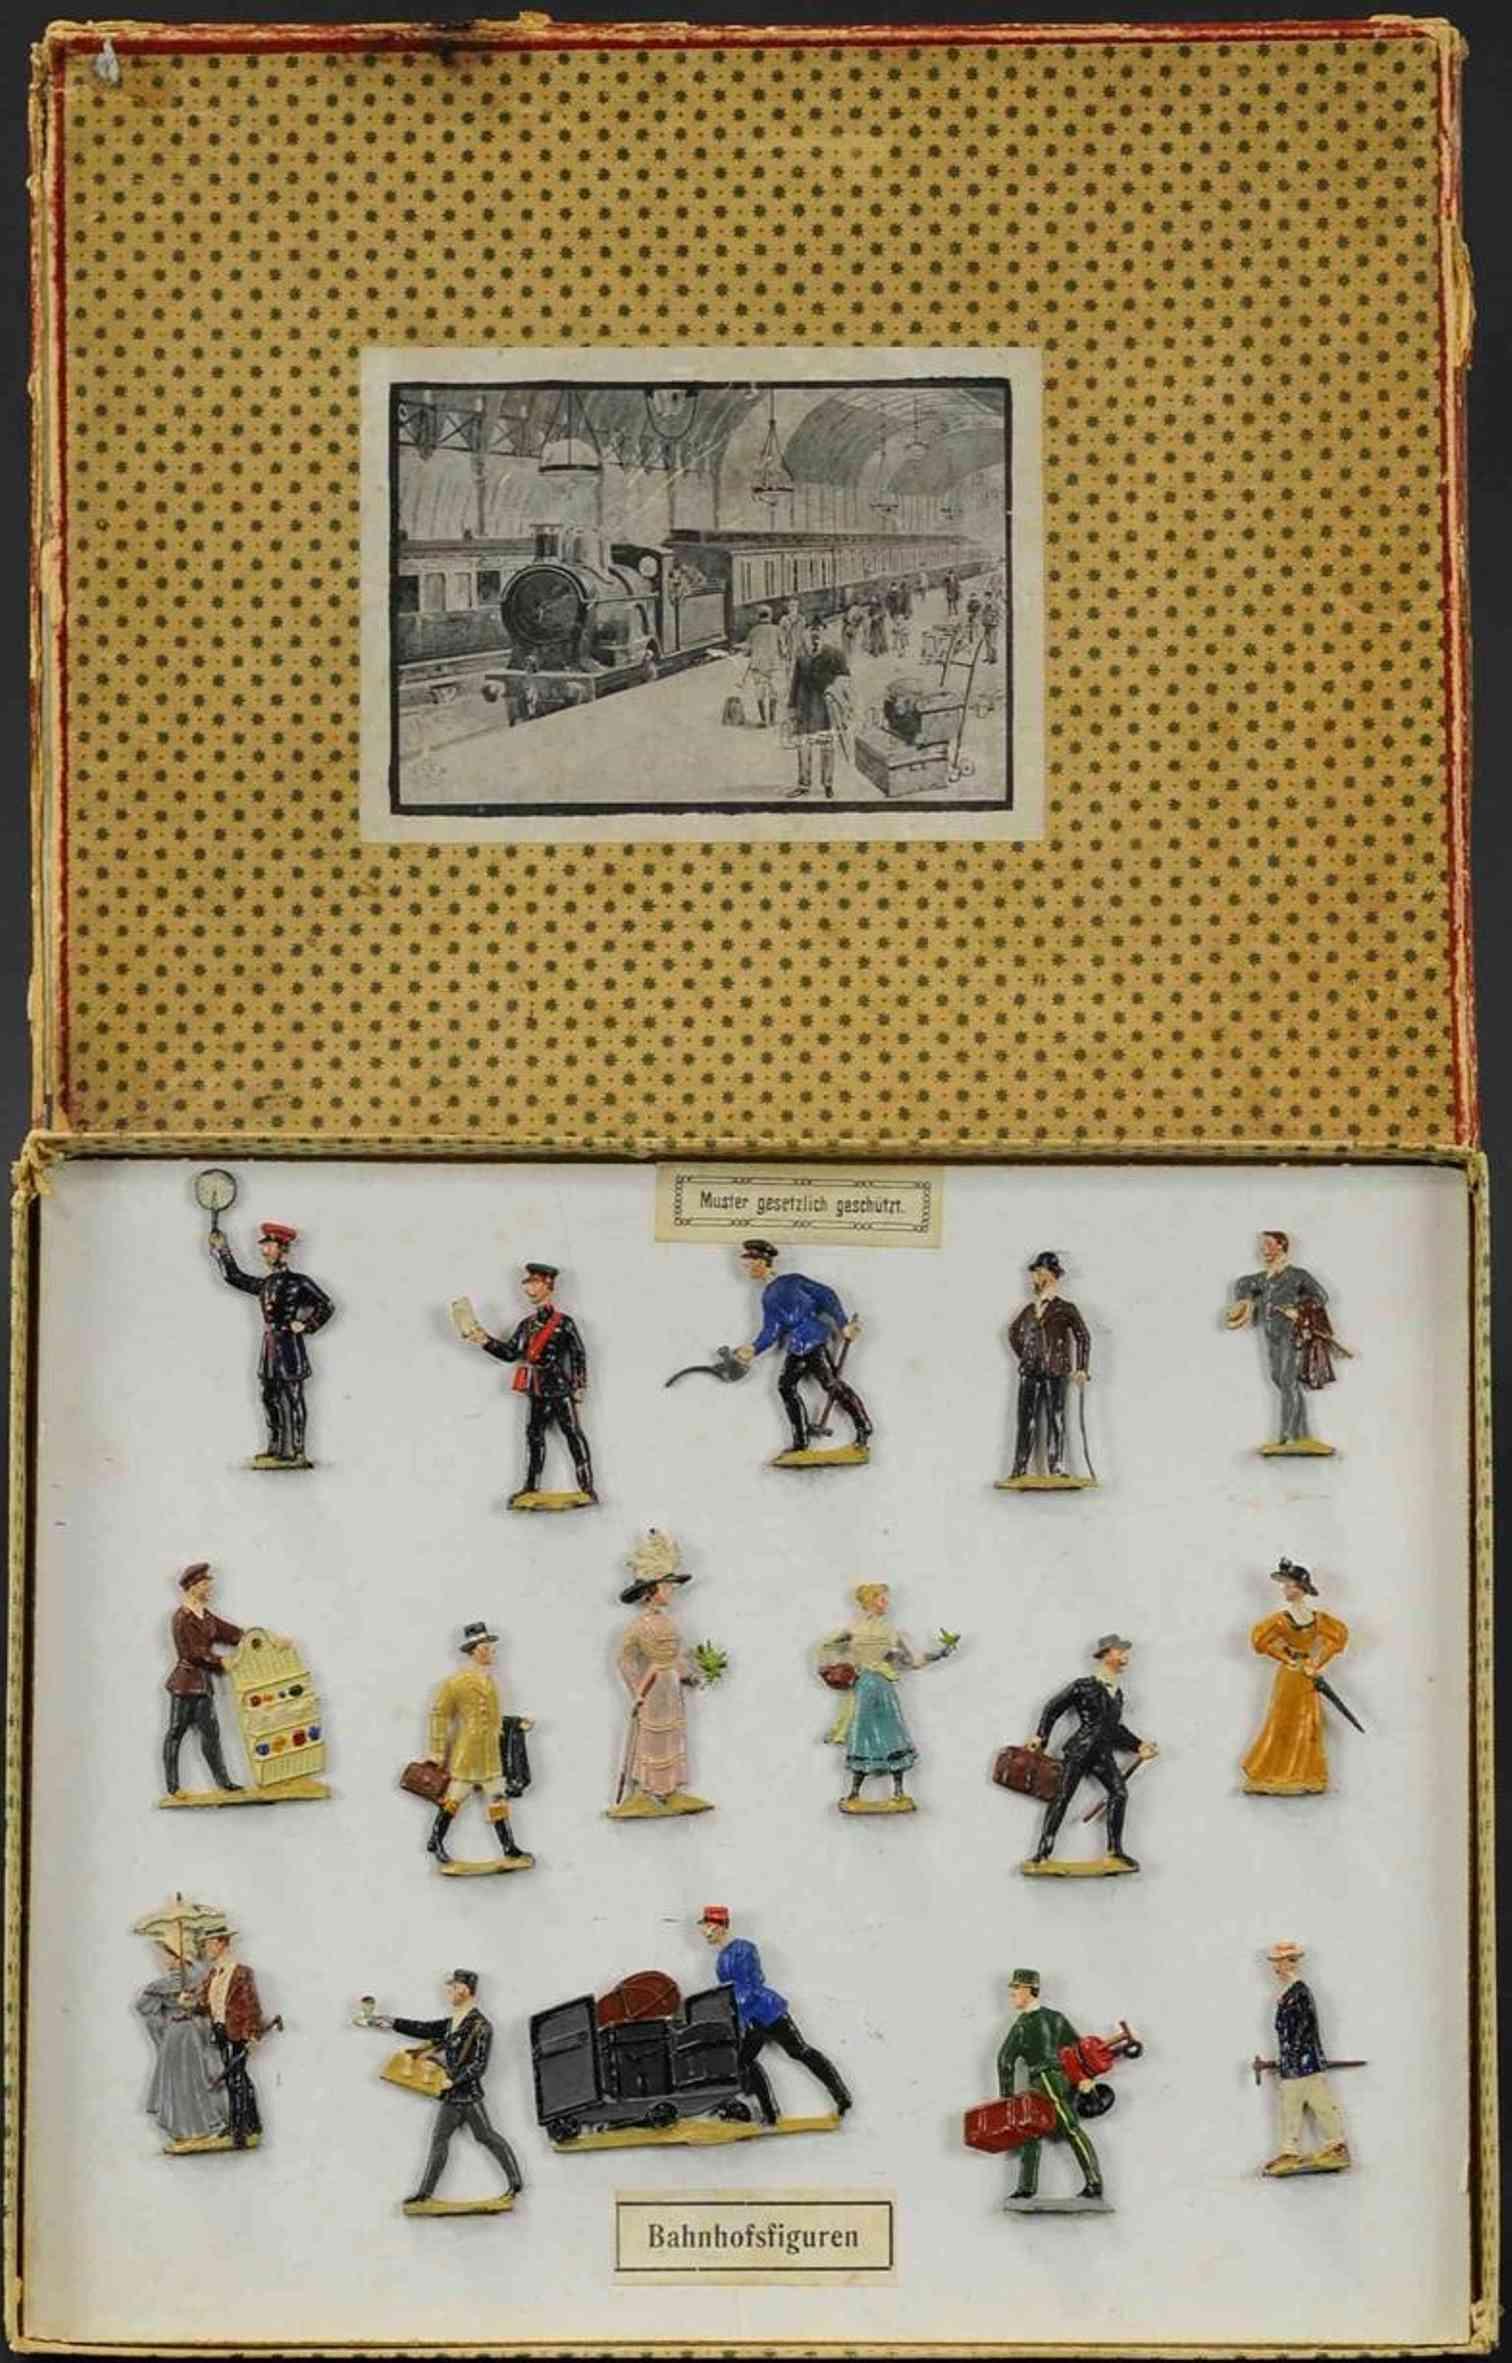 spenkuch bing eisenbahnfiguren viktorianische passagiere haendler